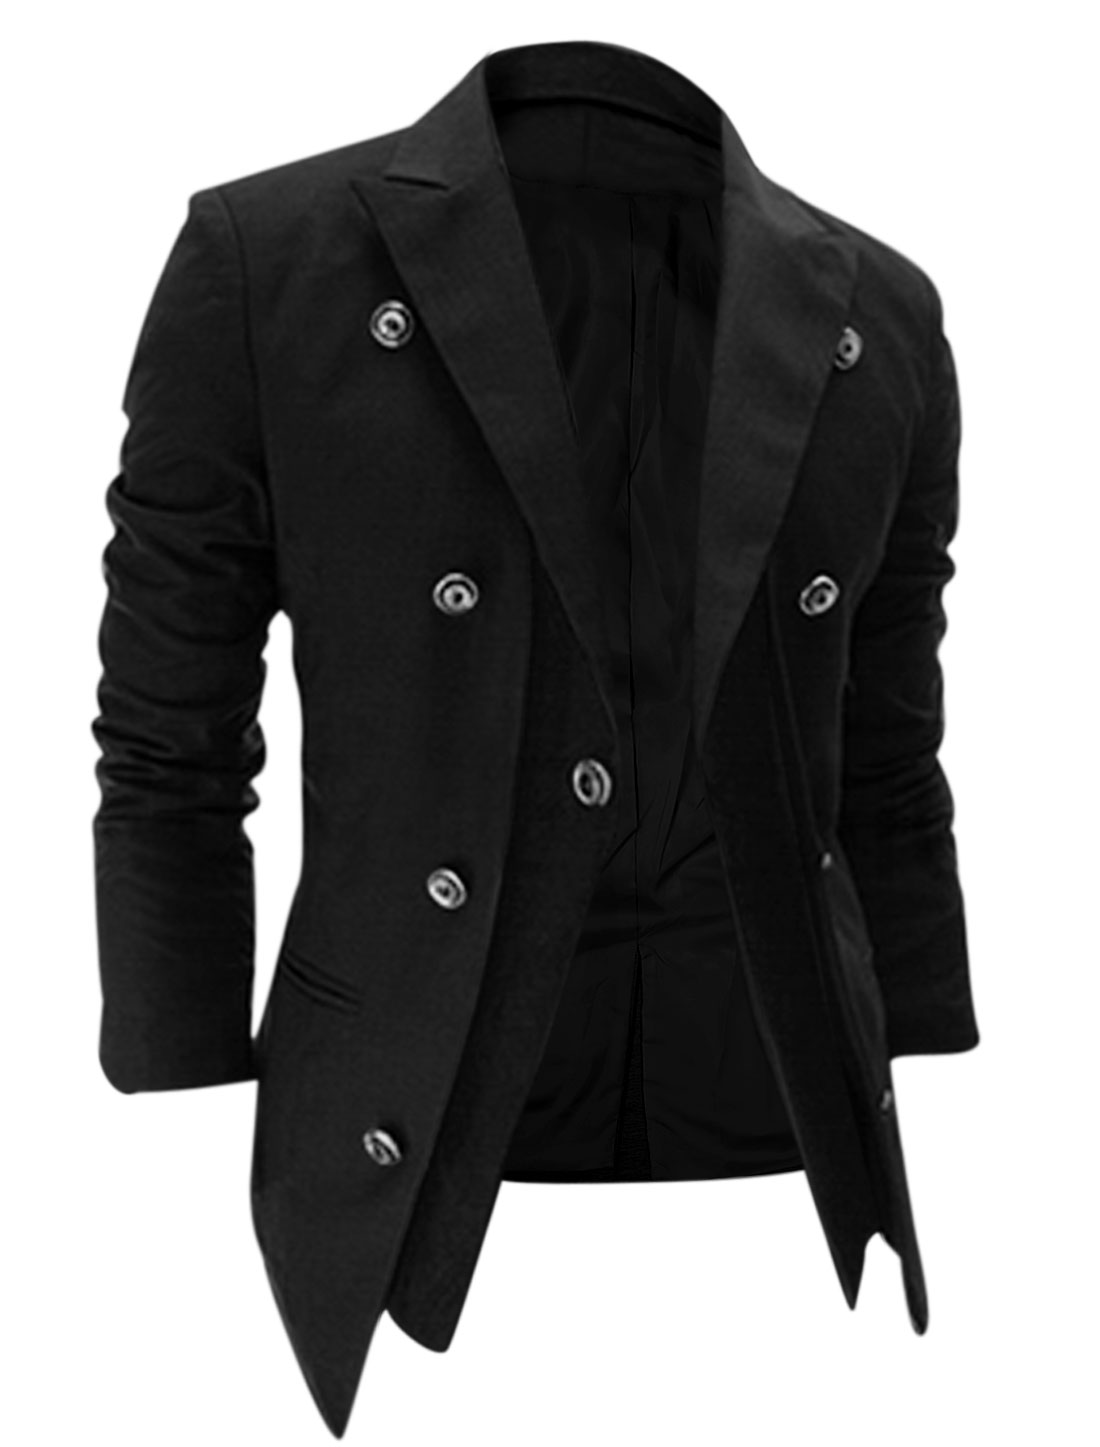 Men One Button Closure Split Back Layered Designs Blazer Jacket Black M